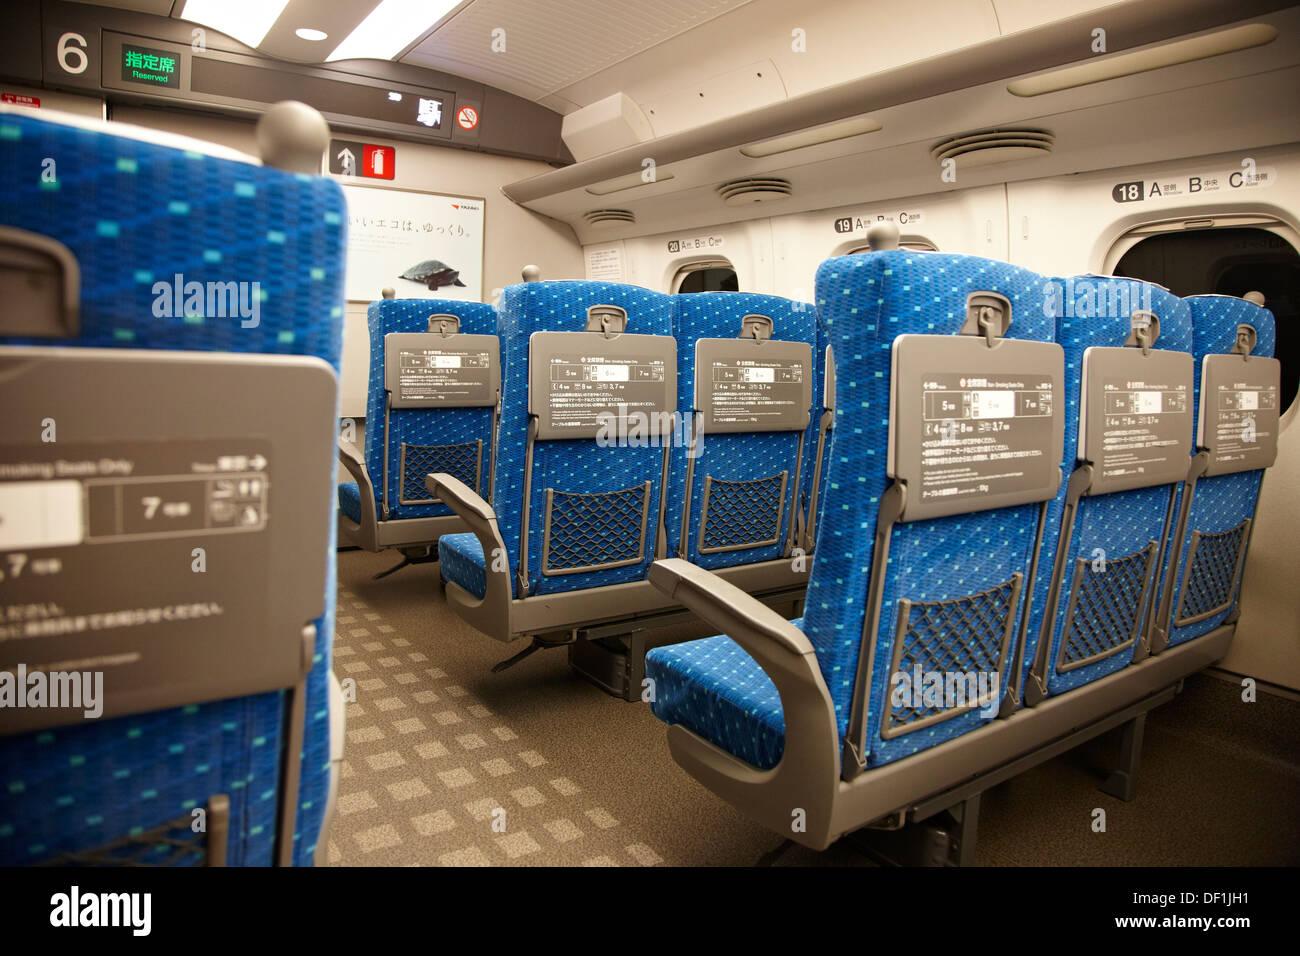 Shinkansen high speed train, Japan. - Stock Image